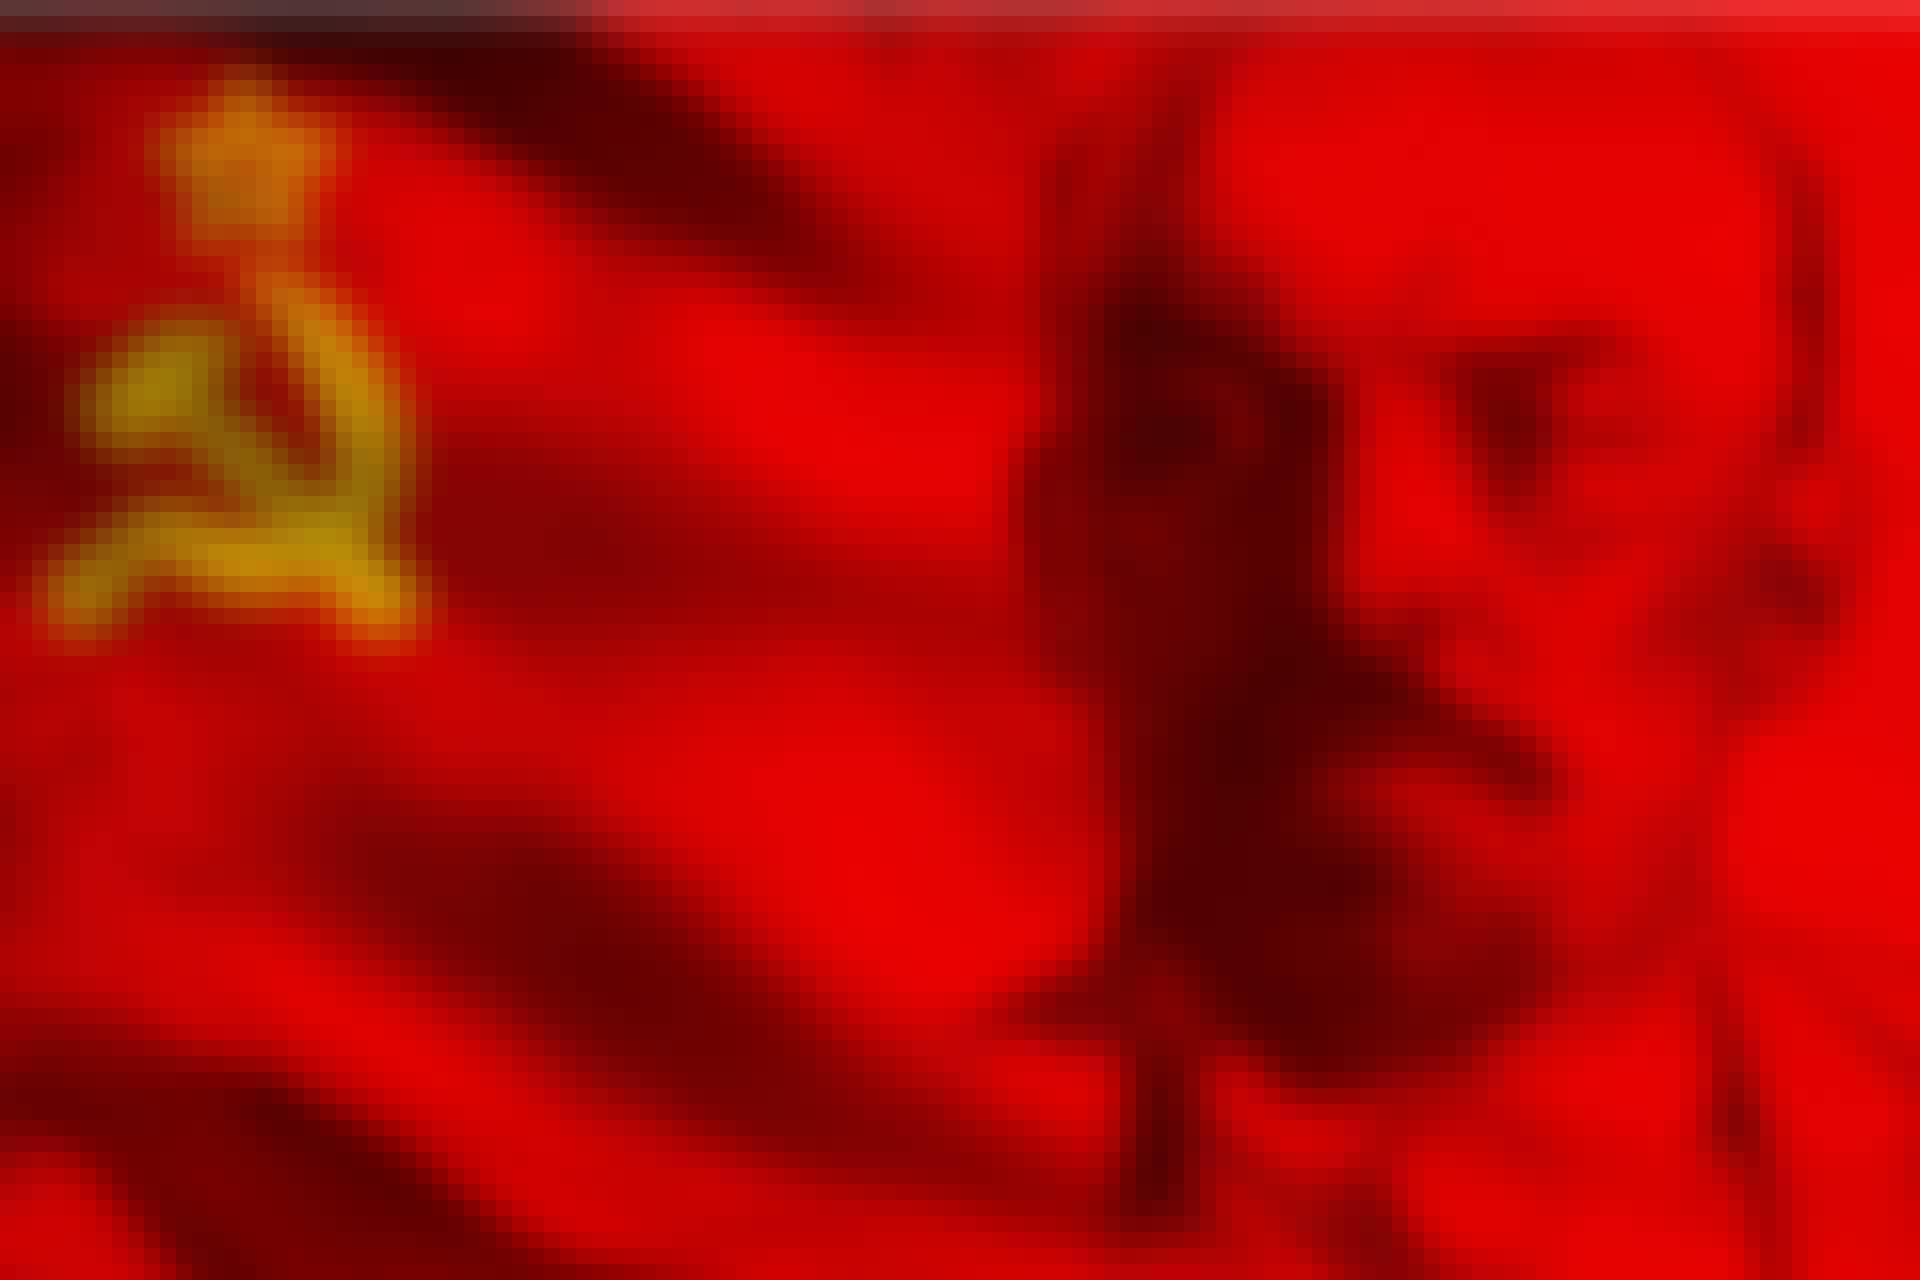 Lenin foran Sovjetunionens flag.